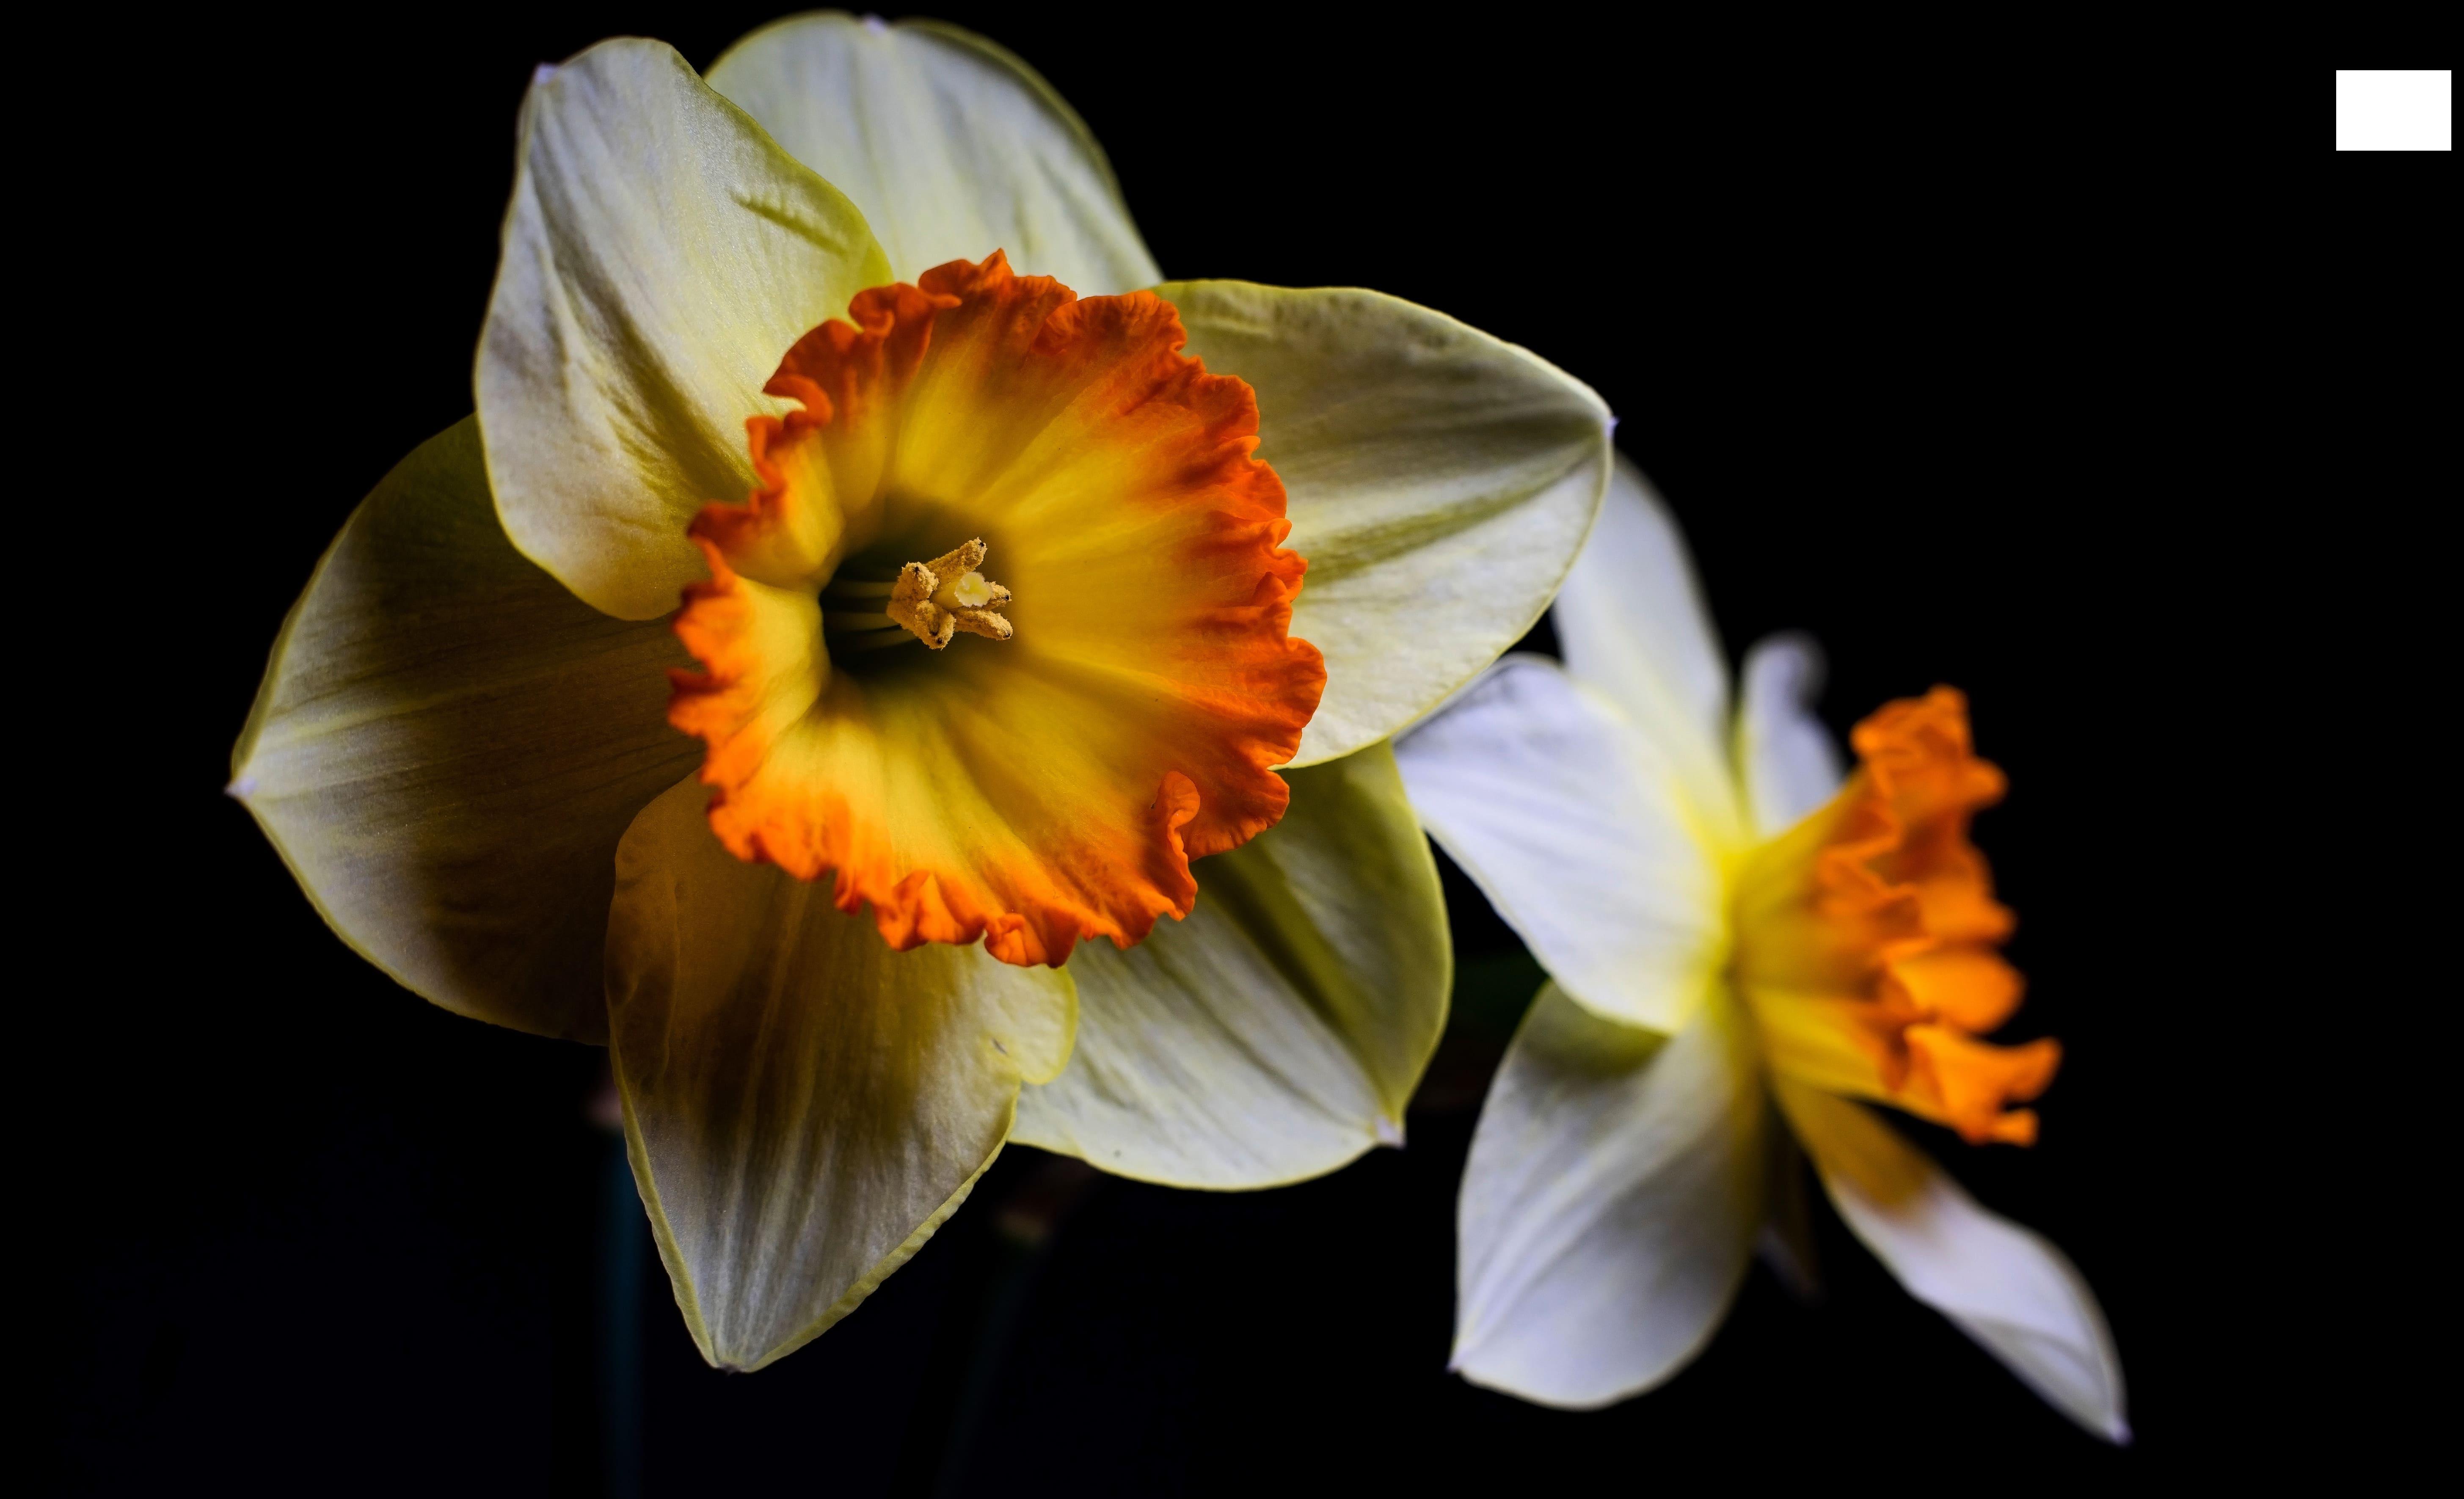 daffodils-photo-72